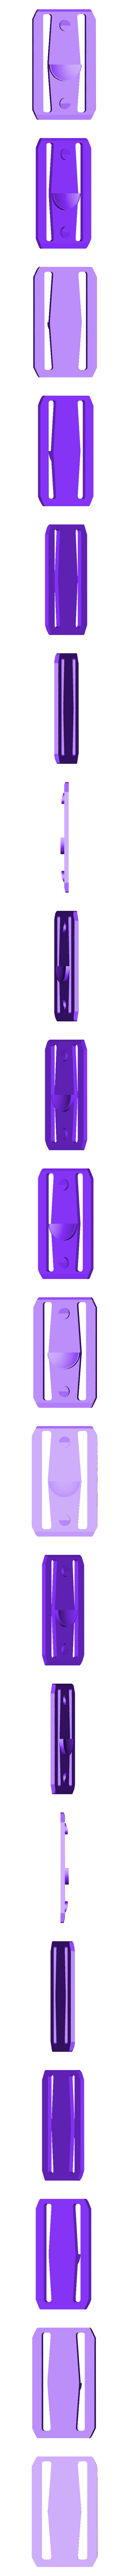 Jouet_Hotwheels_connecteur_demi-lune.stl Download free STL file Hot wheels connector • 3D printing model, legendredavid27